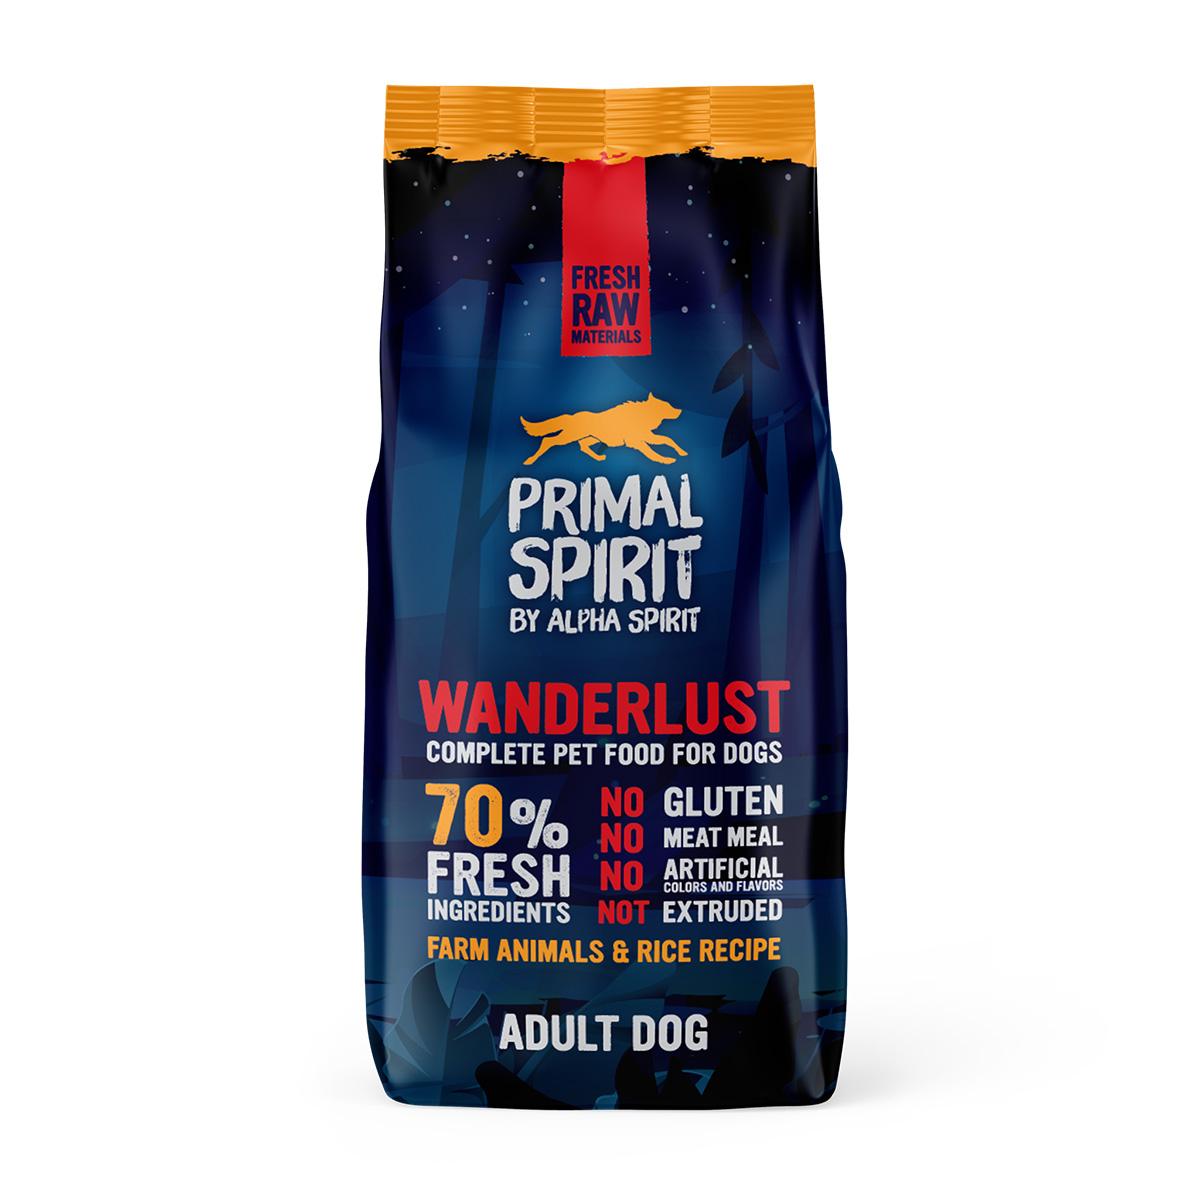 Primal Spirit Dog 70% Wanderlust 12 kg